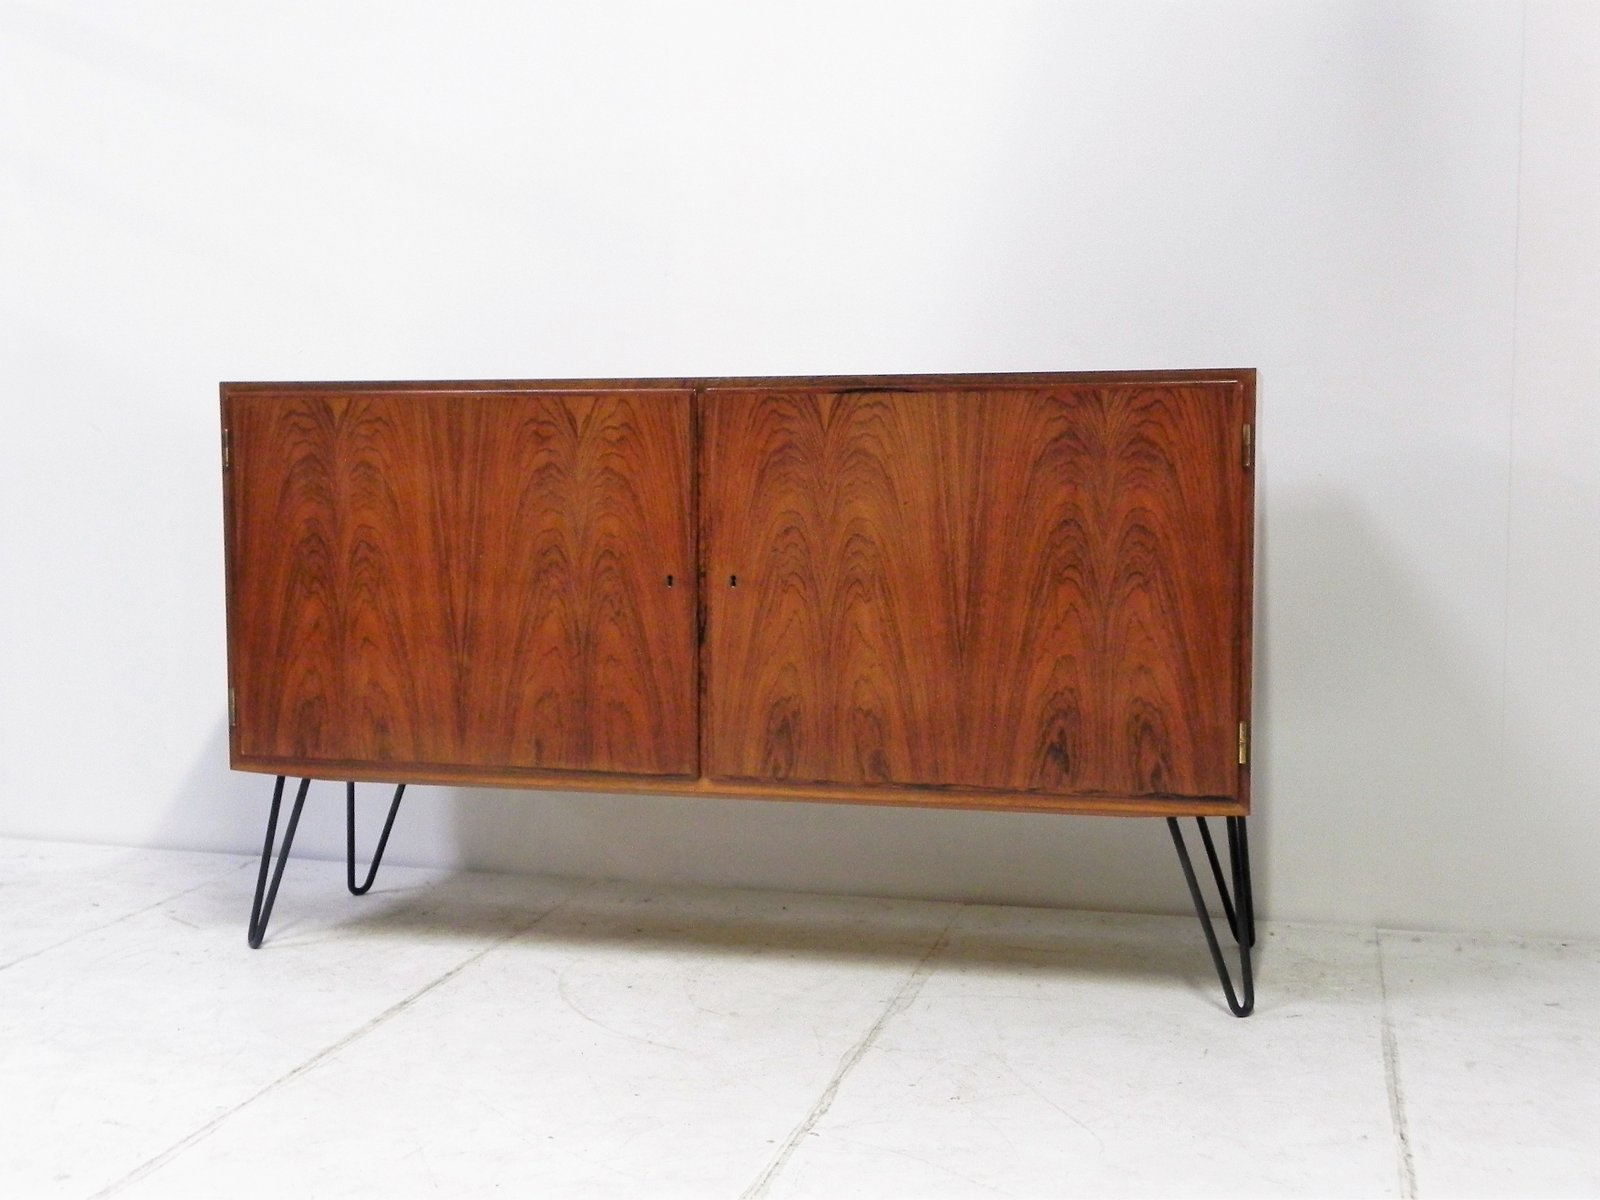 vintage rosewood buffet by poul hundevad for hundevad co for sale at pamono. Black Bedroom Furniture Sets. Home Design Ideas